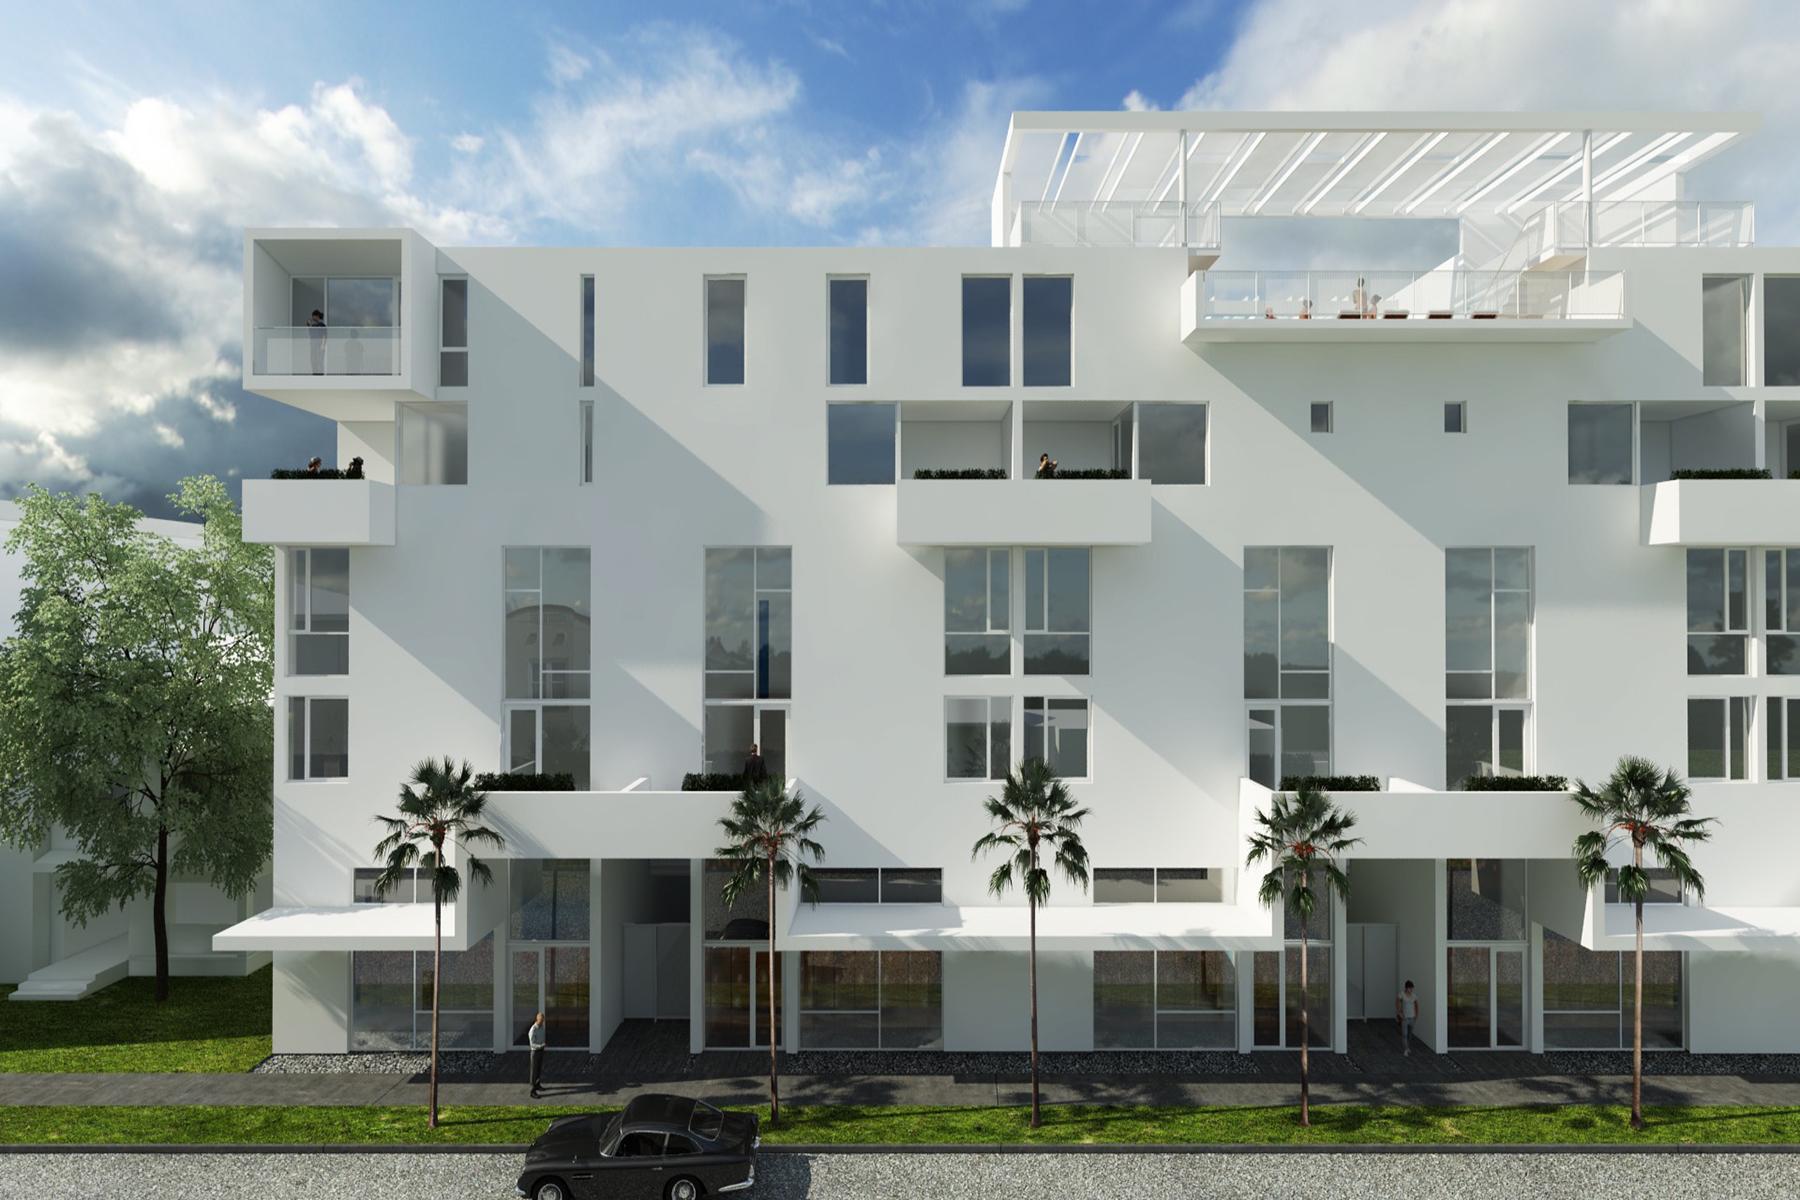 Additional photo for property listing at RISDON ON 5TH 1350  5th St 301,  Sarasota, Florida 34236 United States